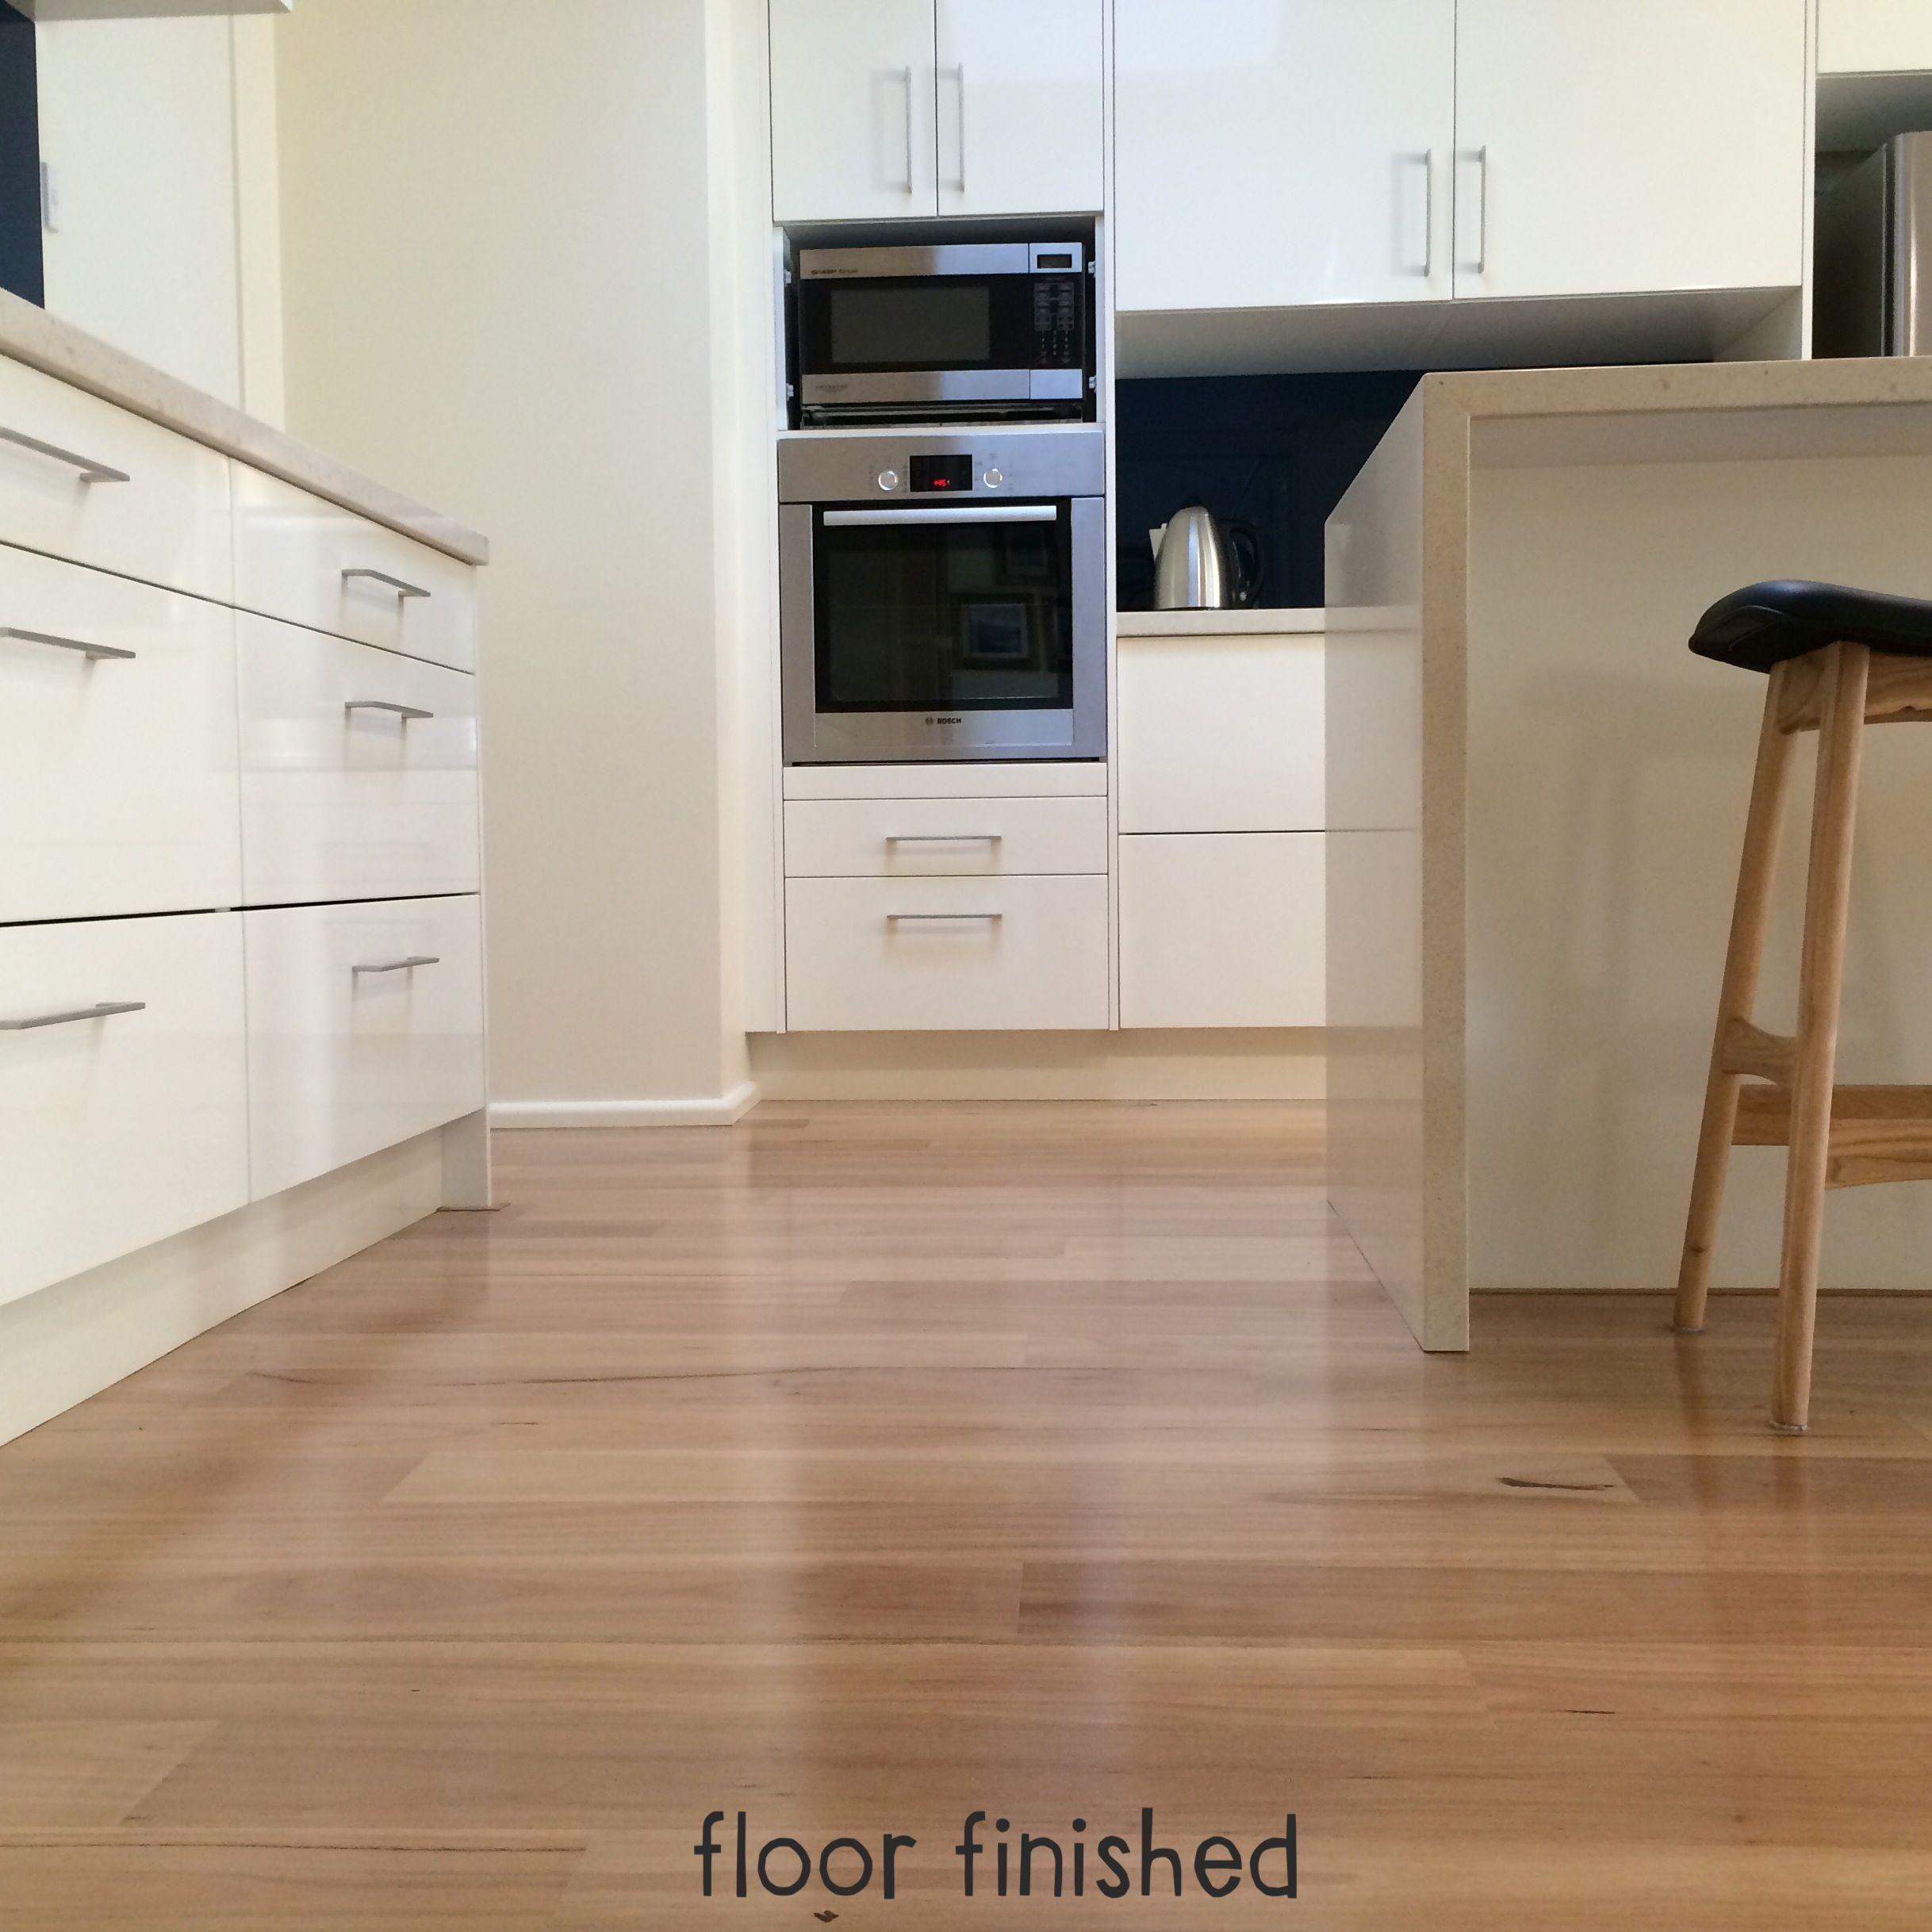 Blackbutt Floors Finish Our New Kitchen. Fiona Moore